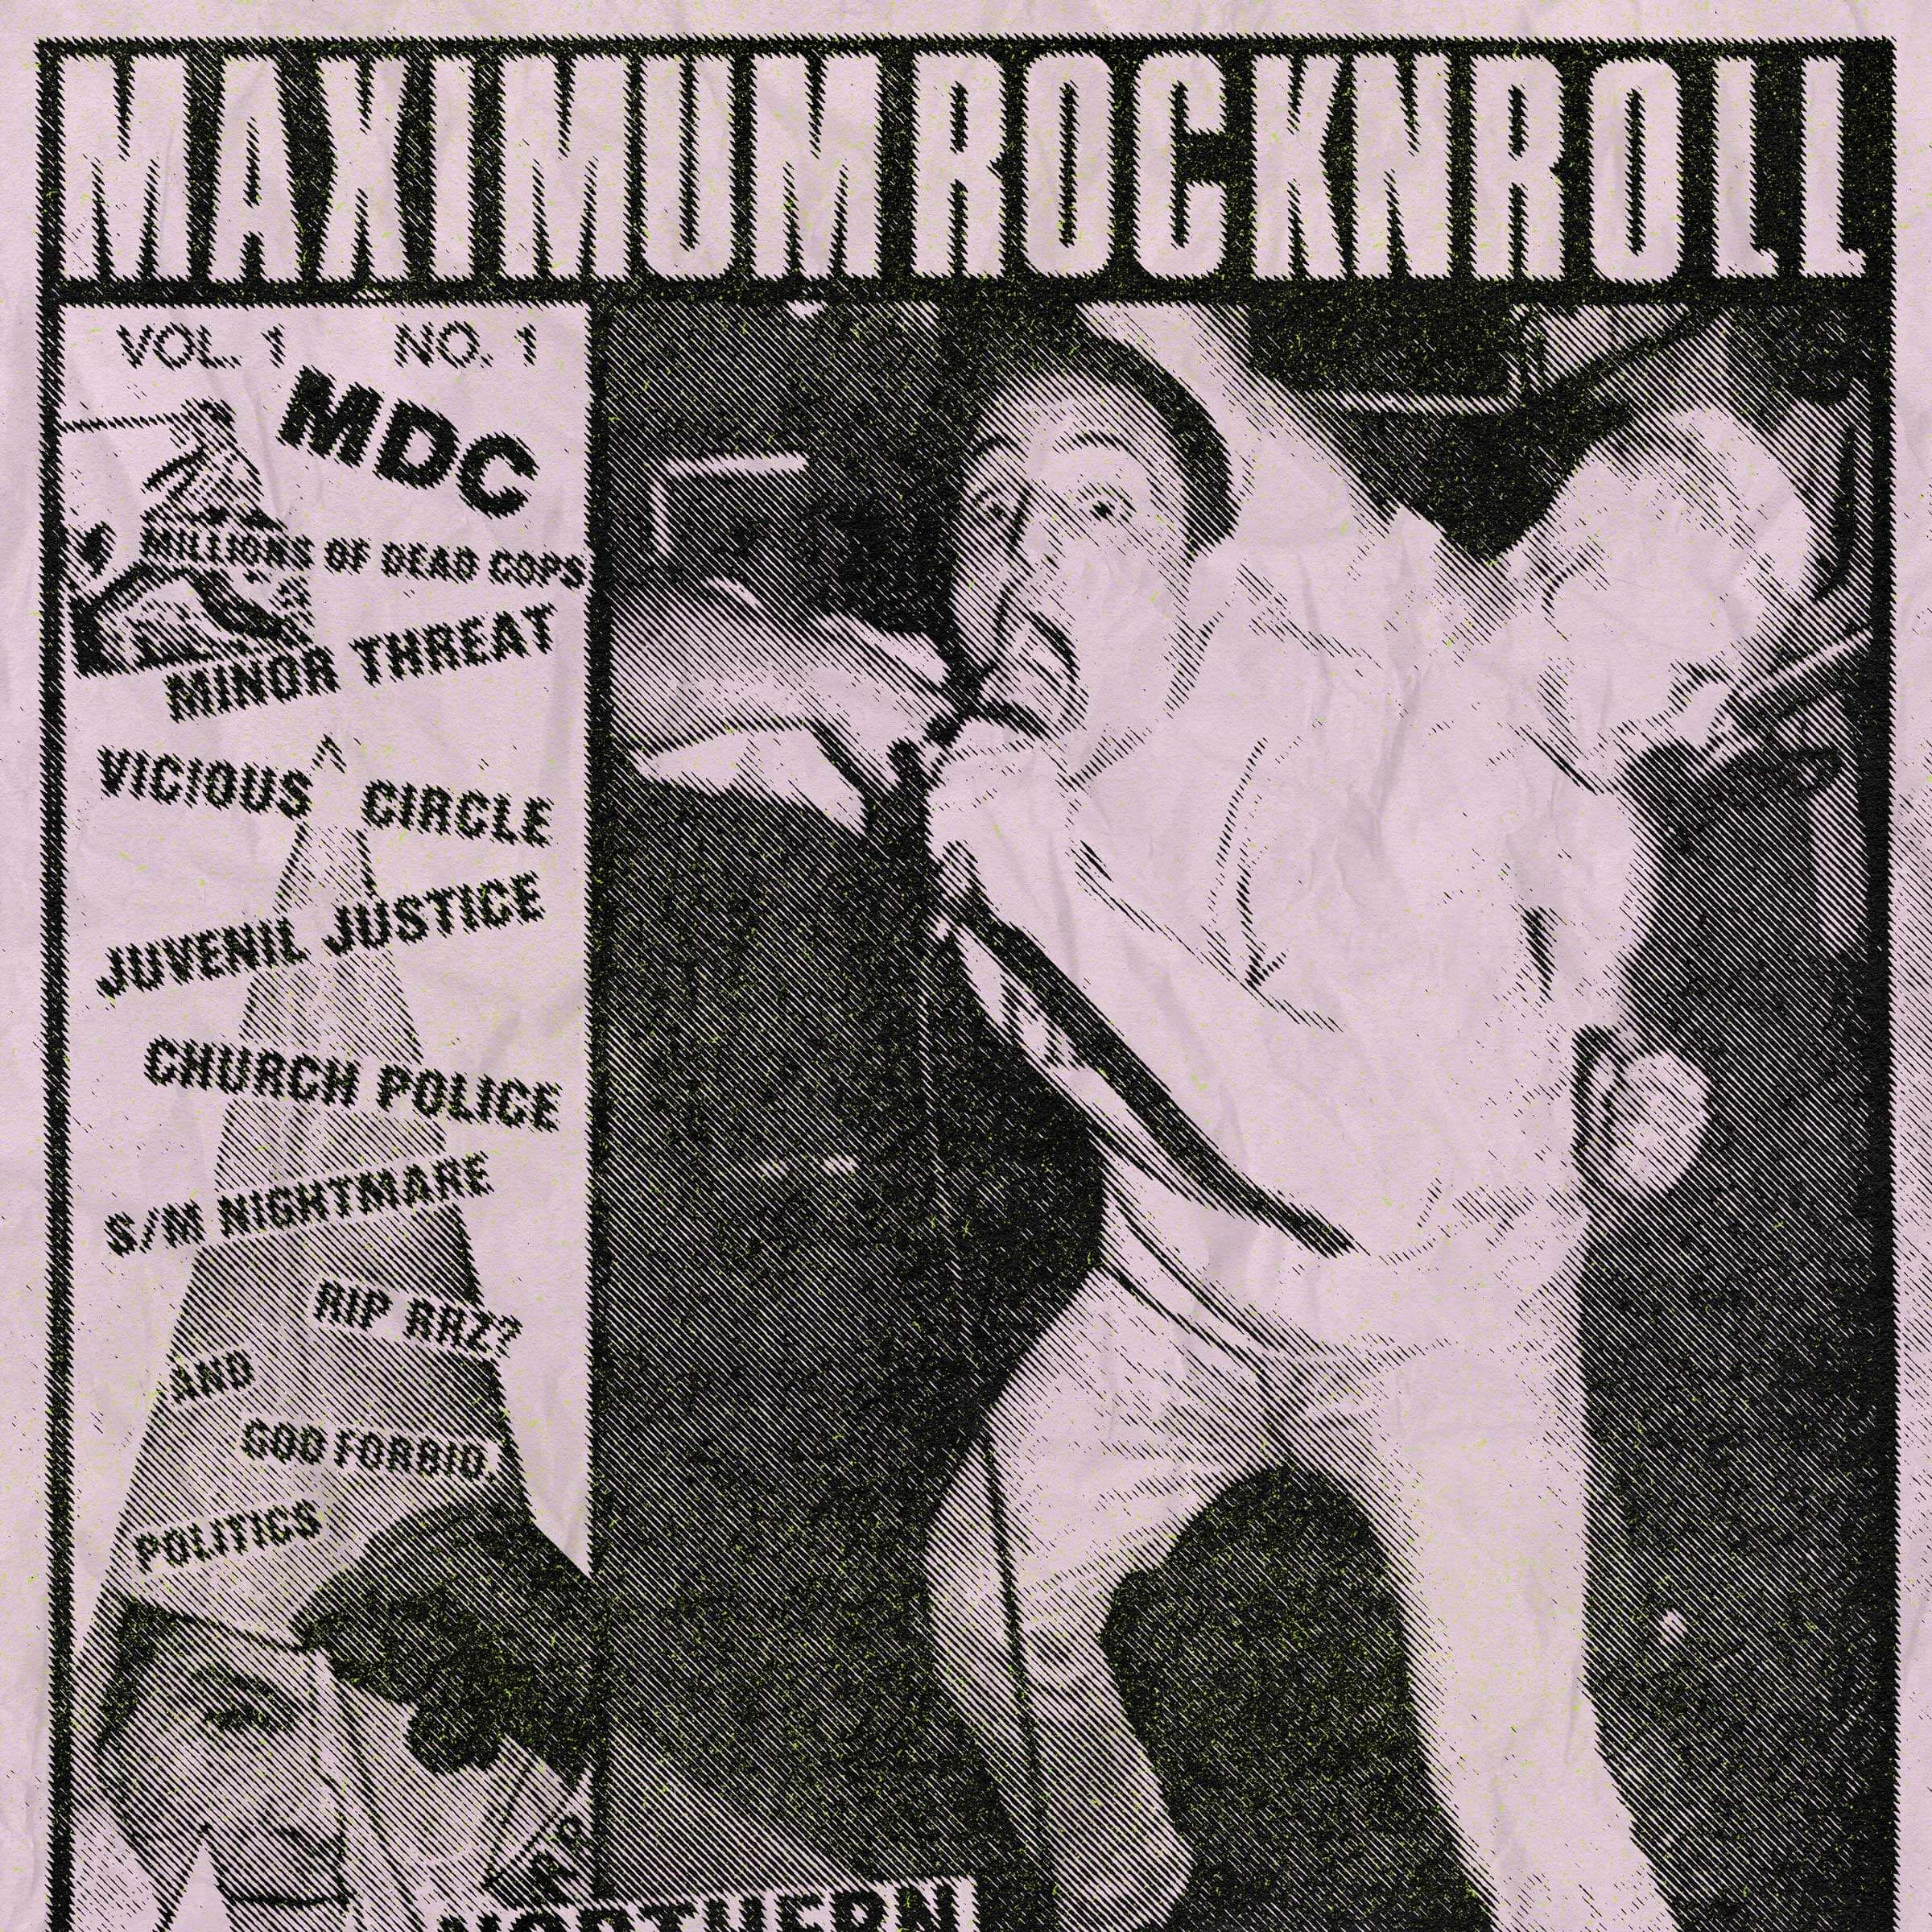 Maximum Rock n Roll magazine cover.